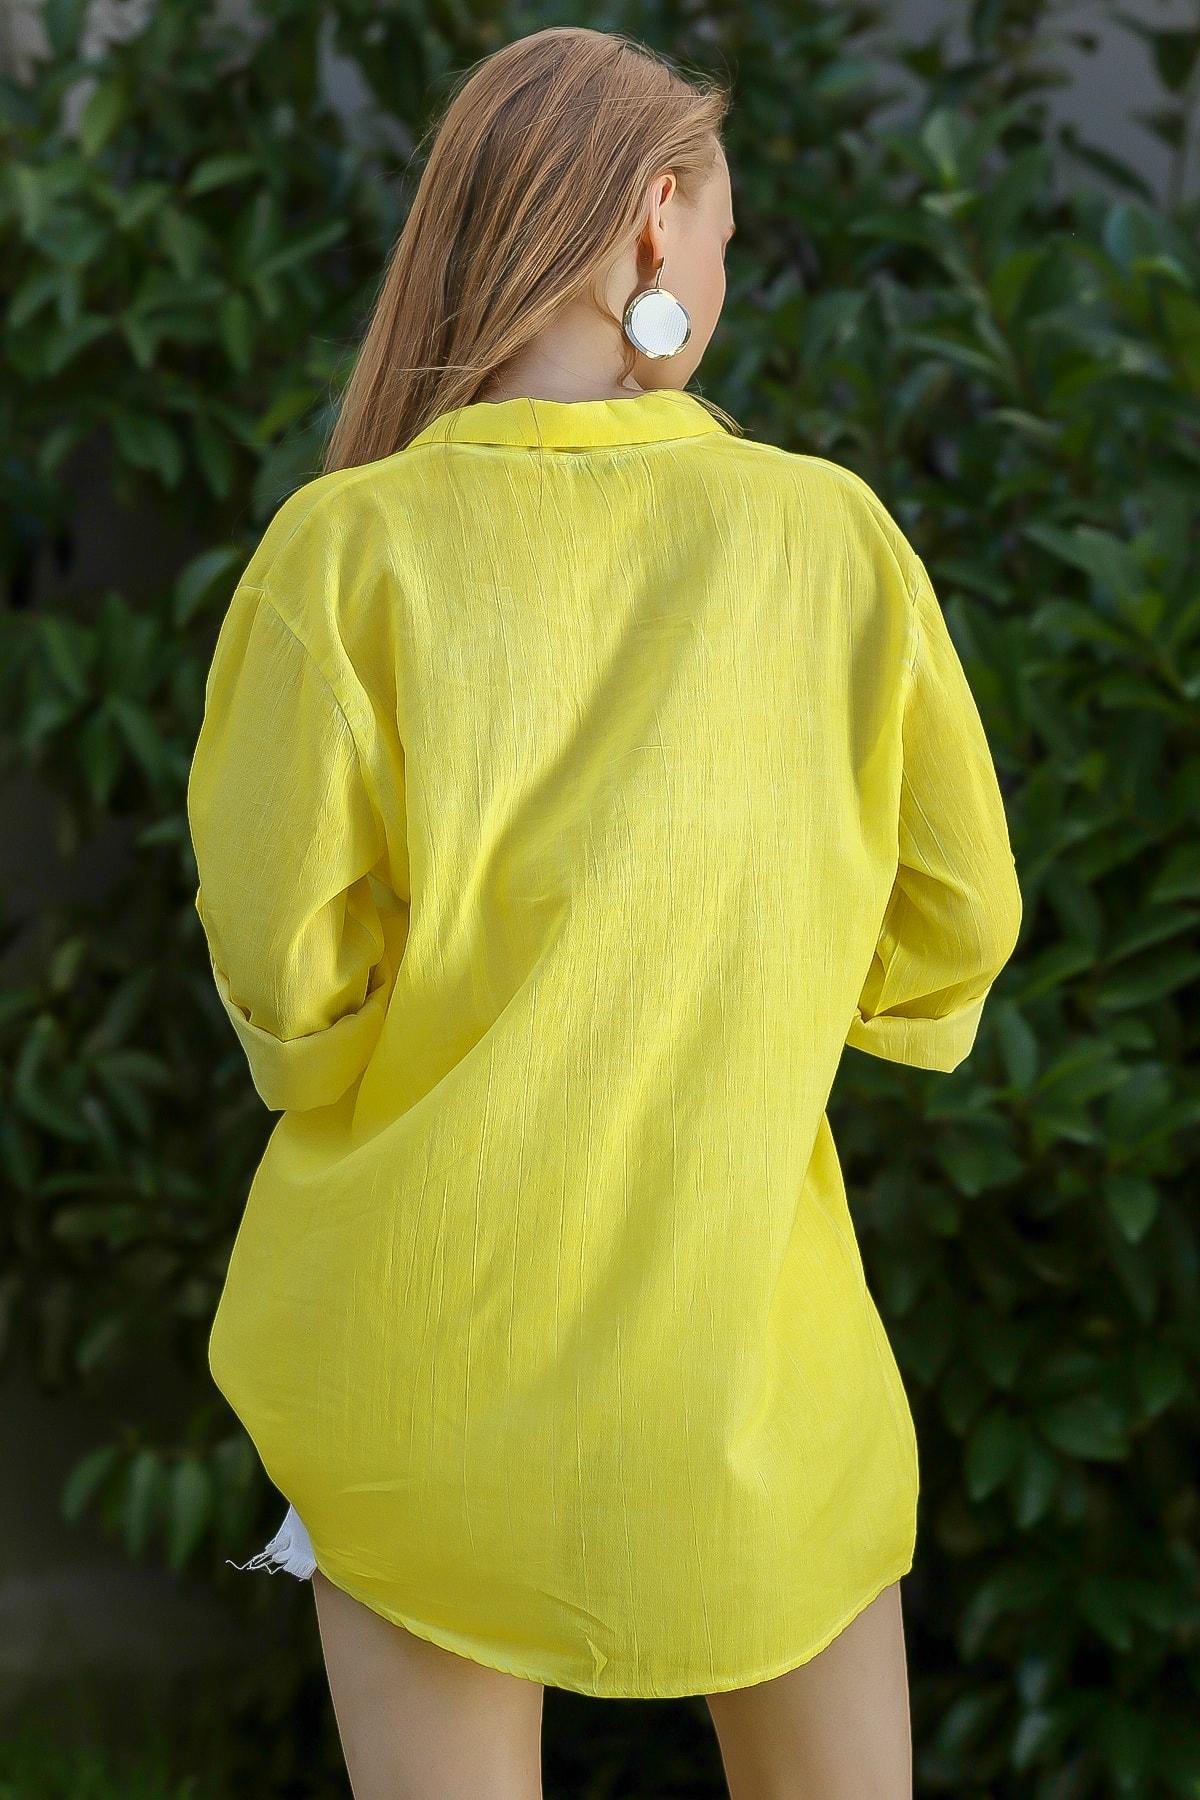 Chiccy Kadın Neon Sarı Casual Gömlek Yaka Pat Detaylı Yıkamalı Tunik Bluz M10010200Bl96076 4